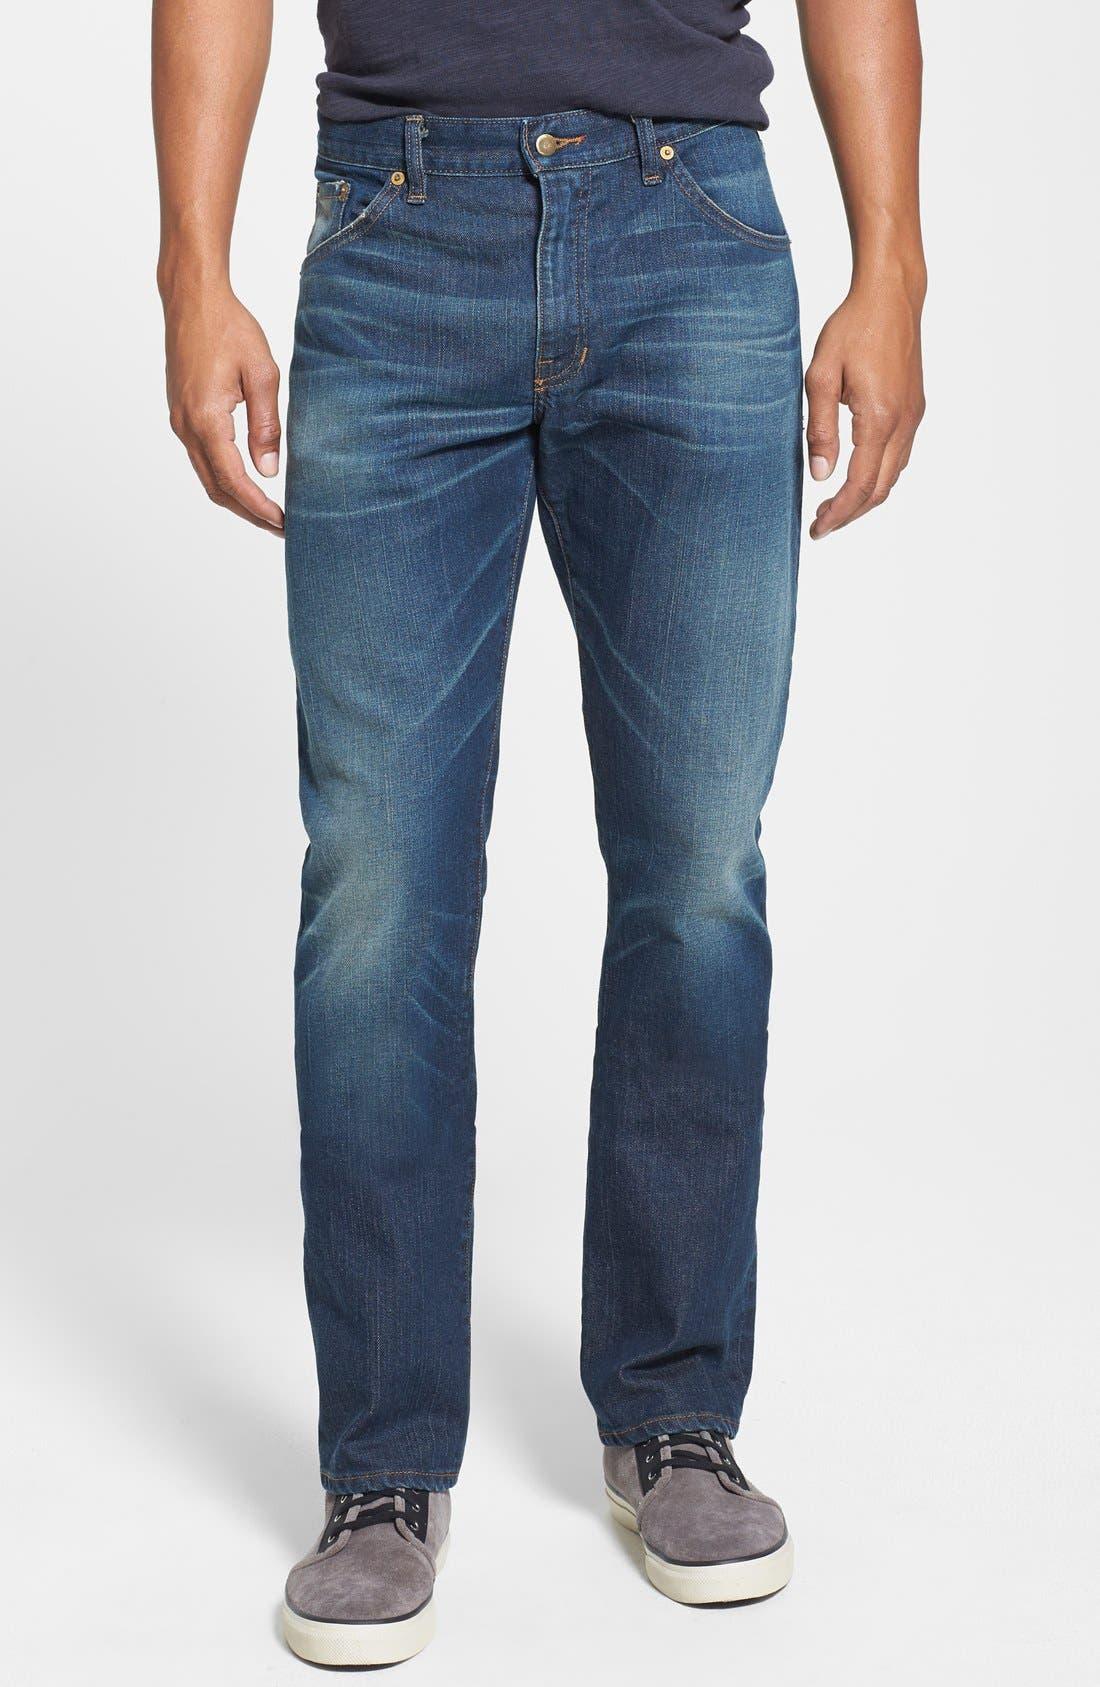 Alternate Image 1 Selected - Raleigh Denim 'Jones' Slim Straight Fit Jeans (Camp)